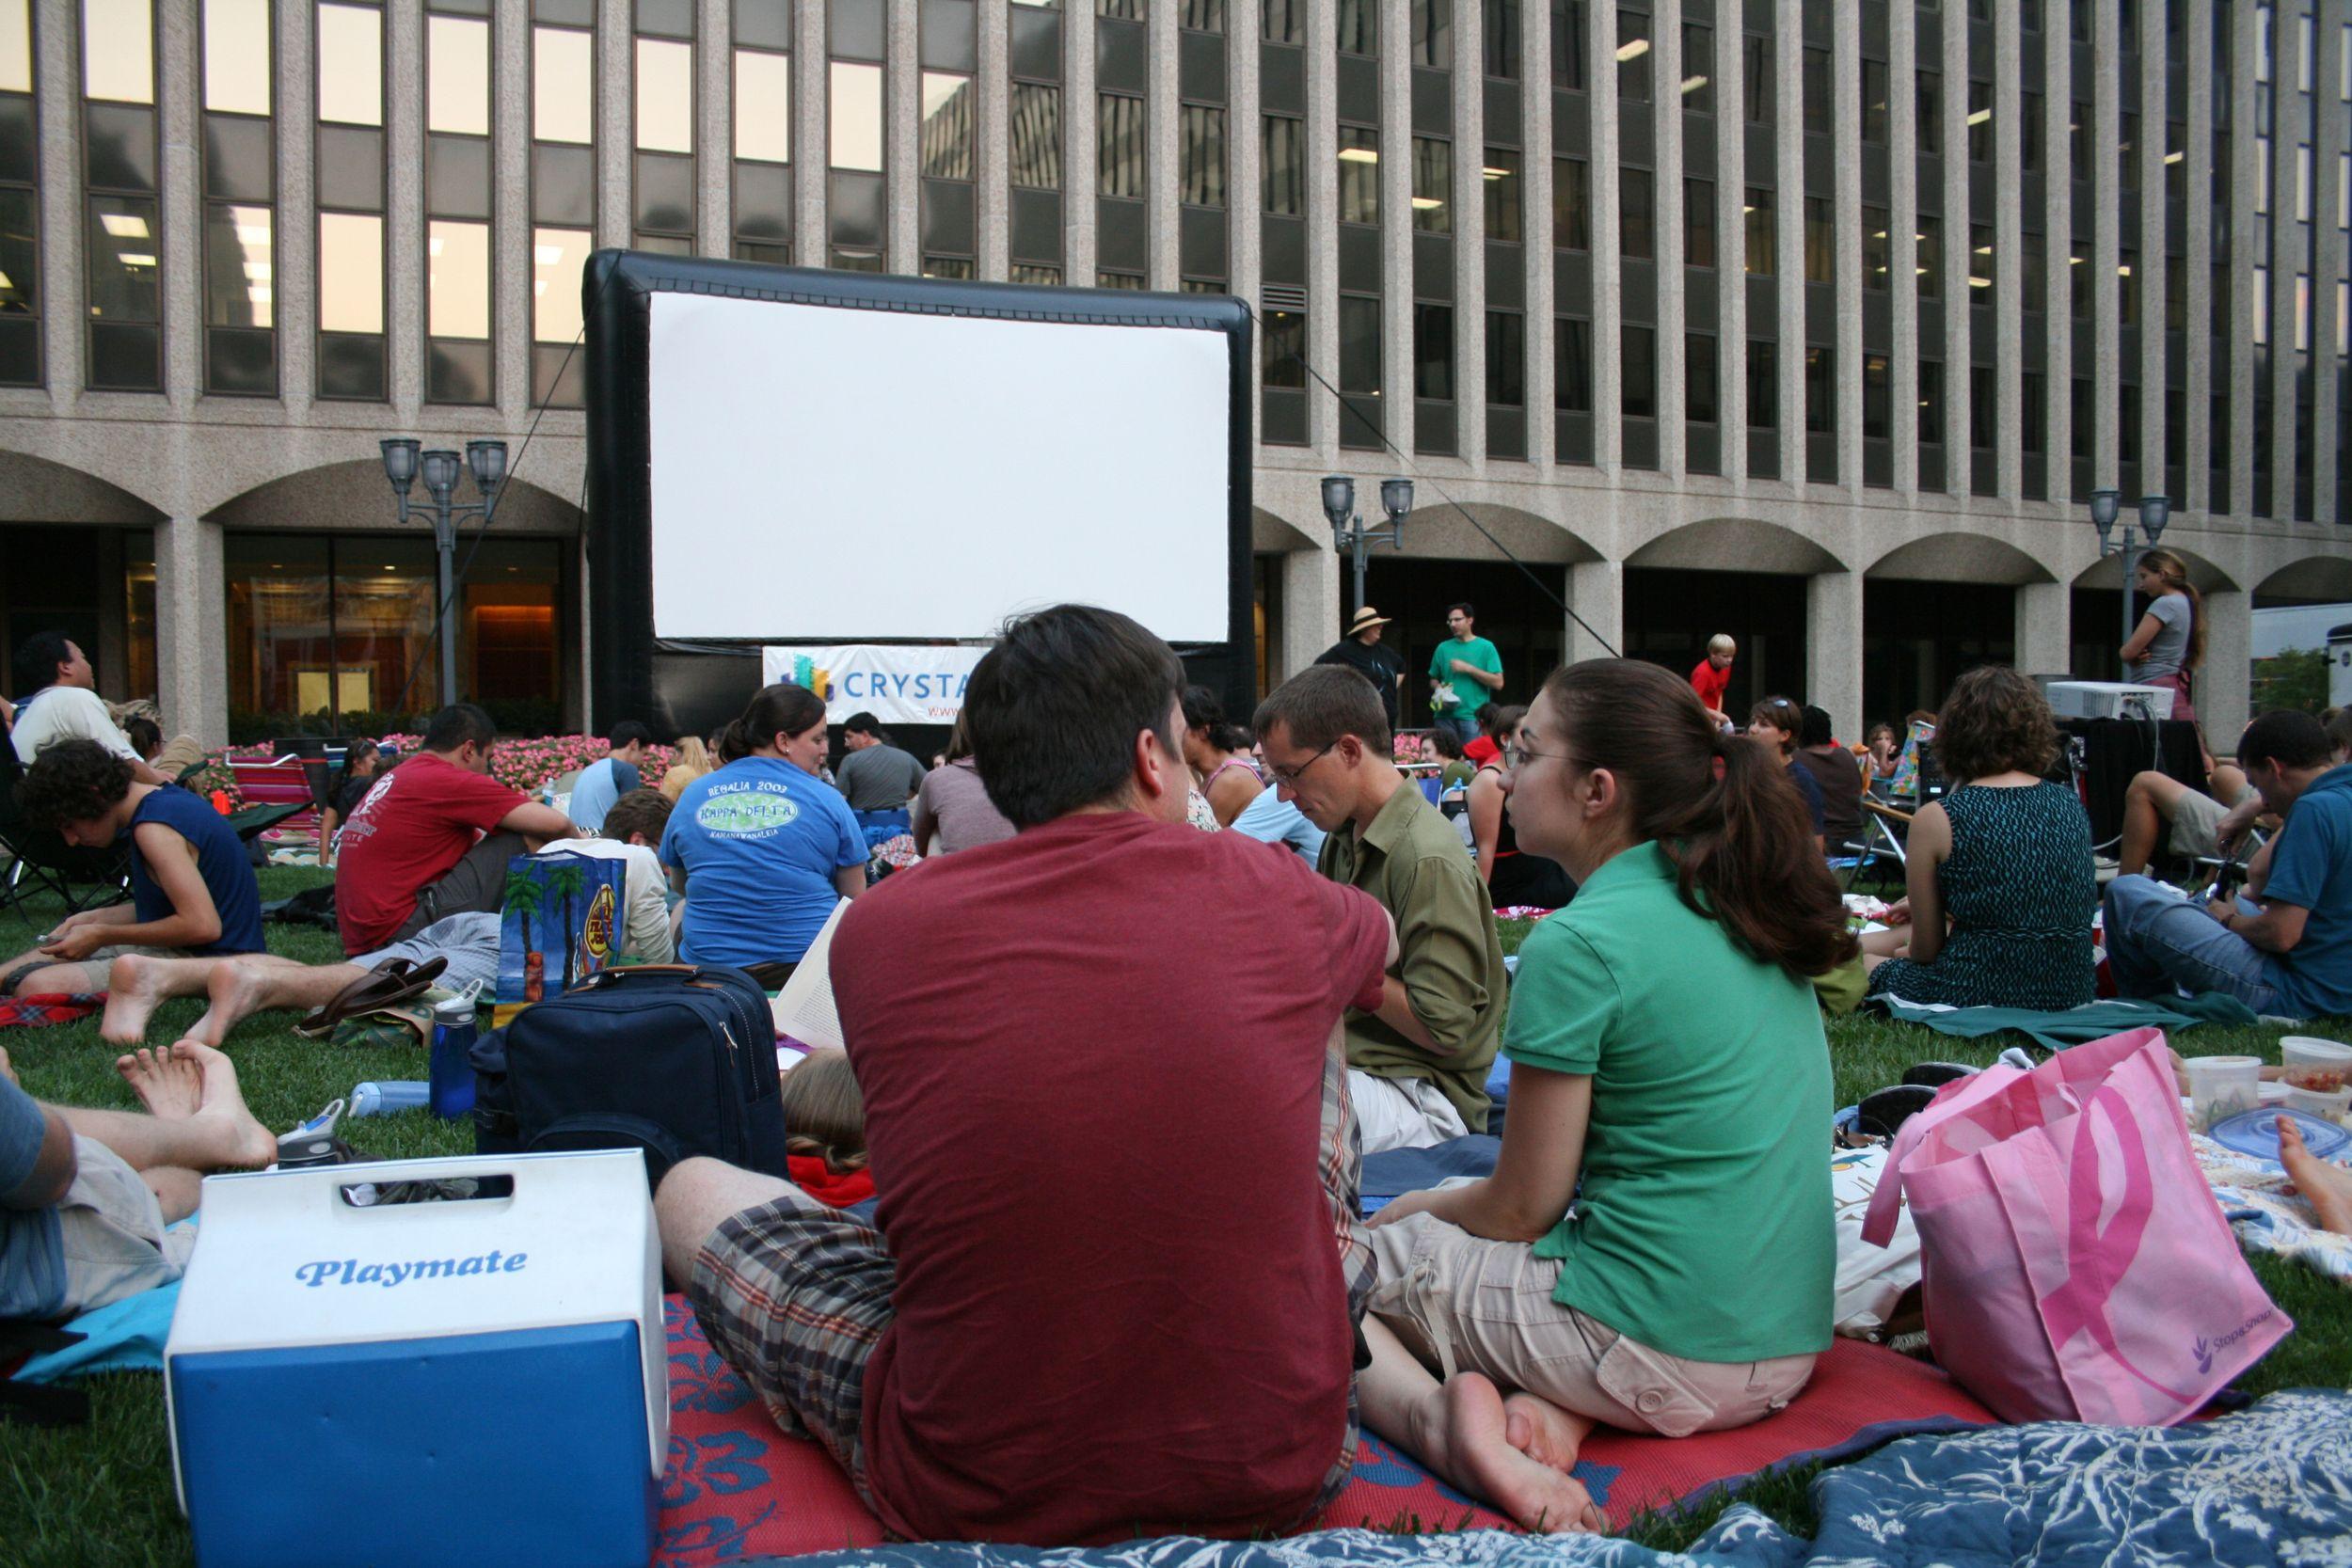 Crystal City outdoor movie screening, Arlington, Va. (With